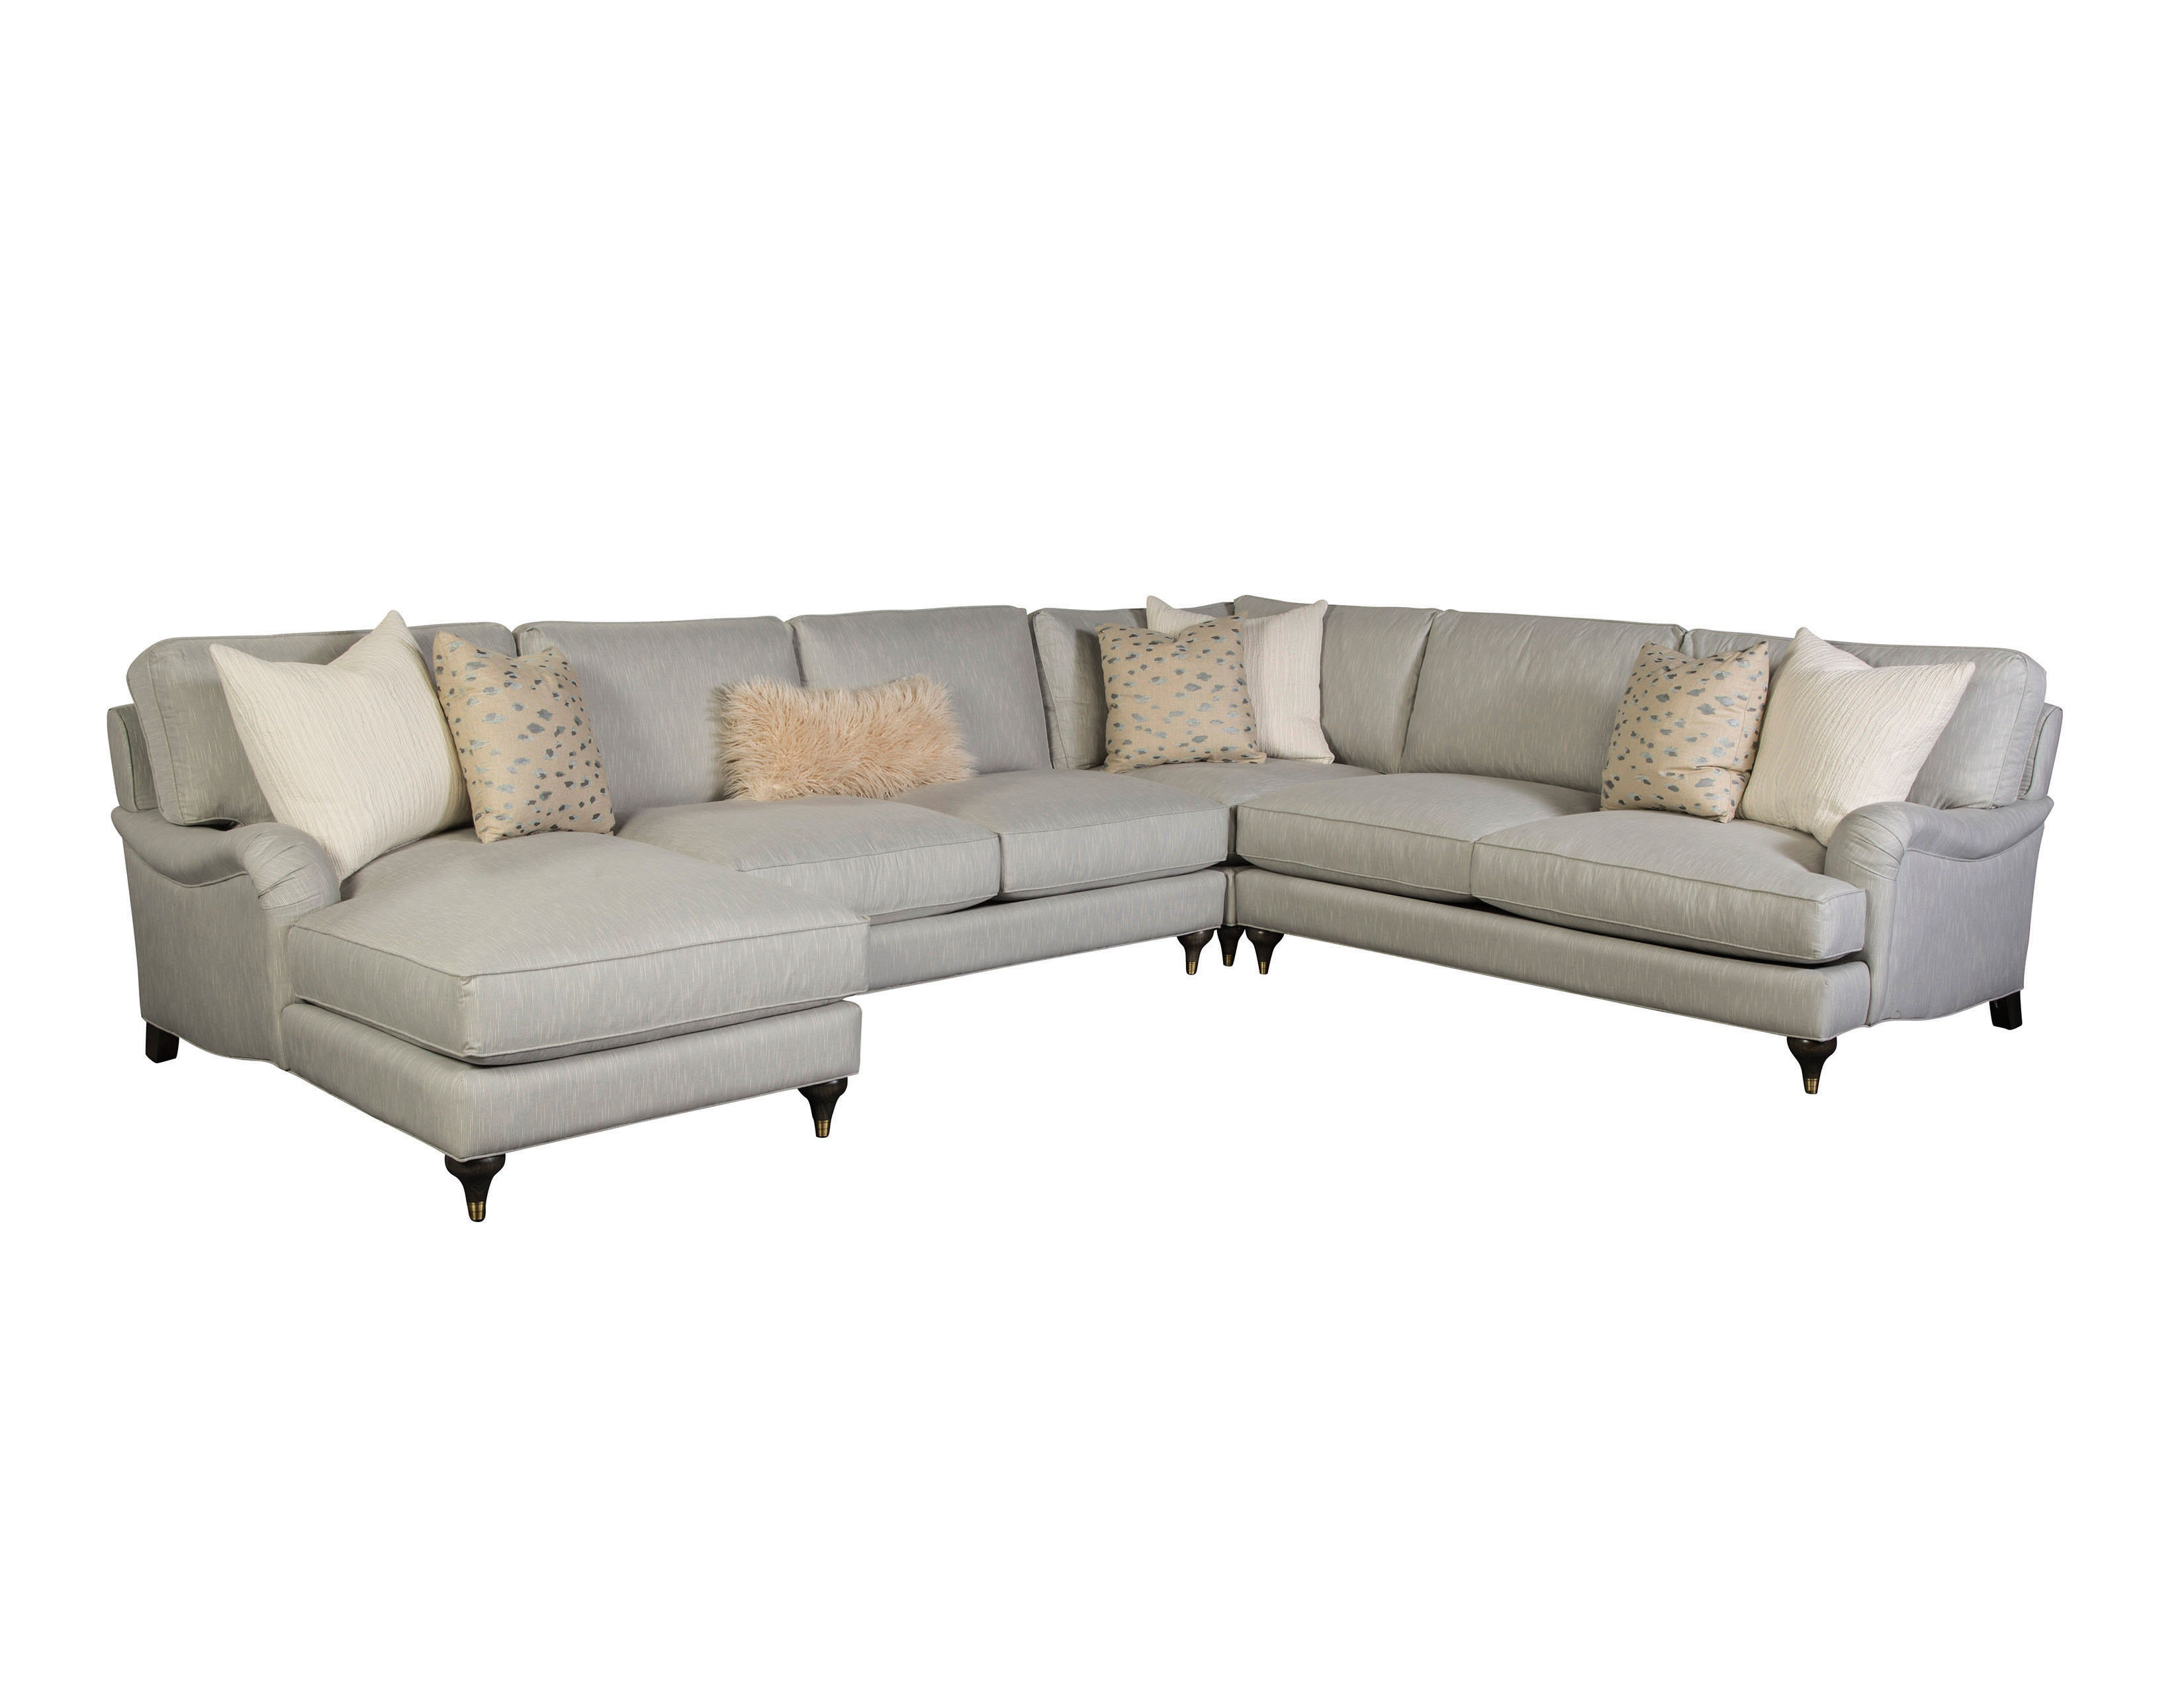 Jonathan Louis International Left Arm Facing Condo Sofa 30826L